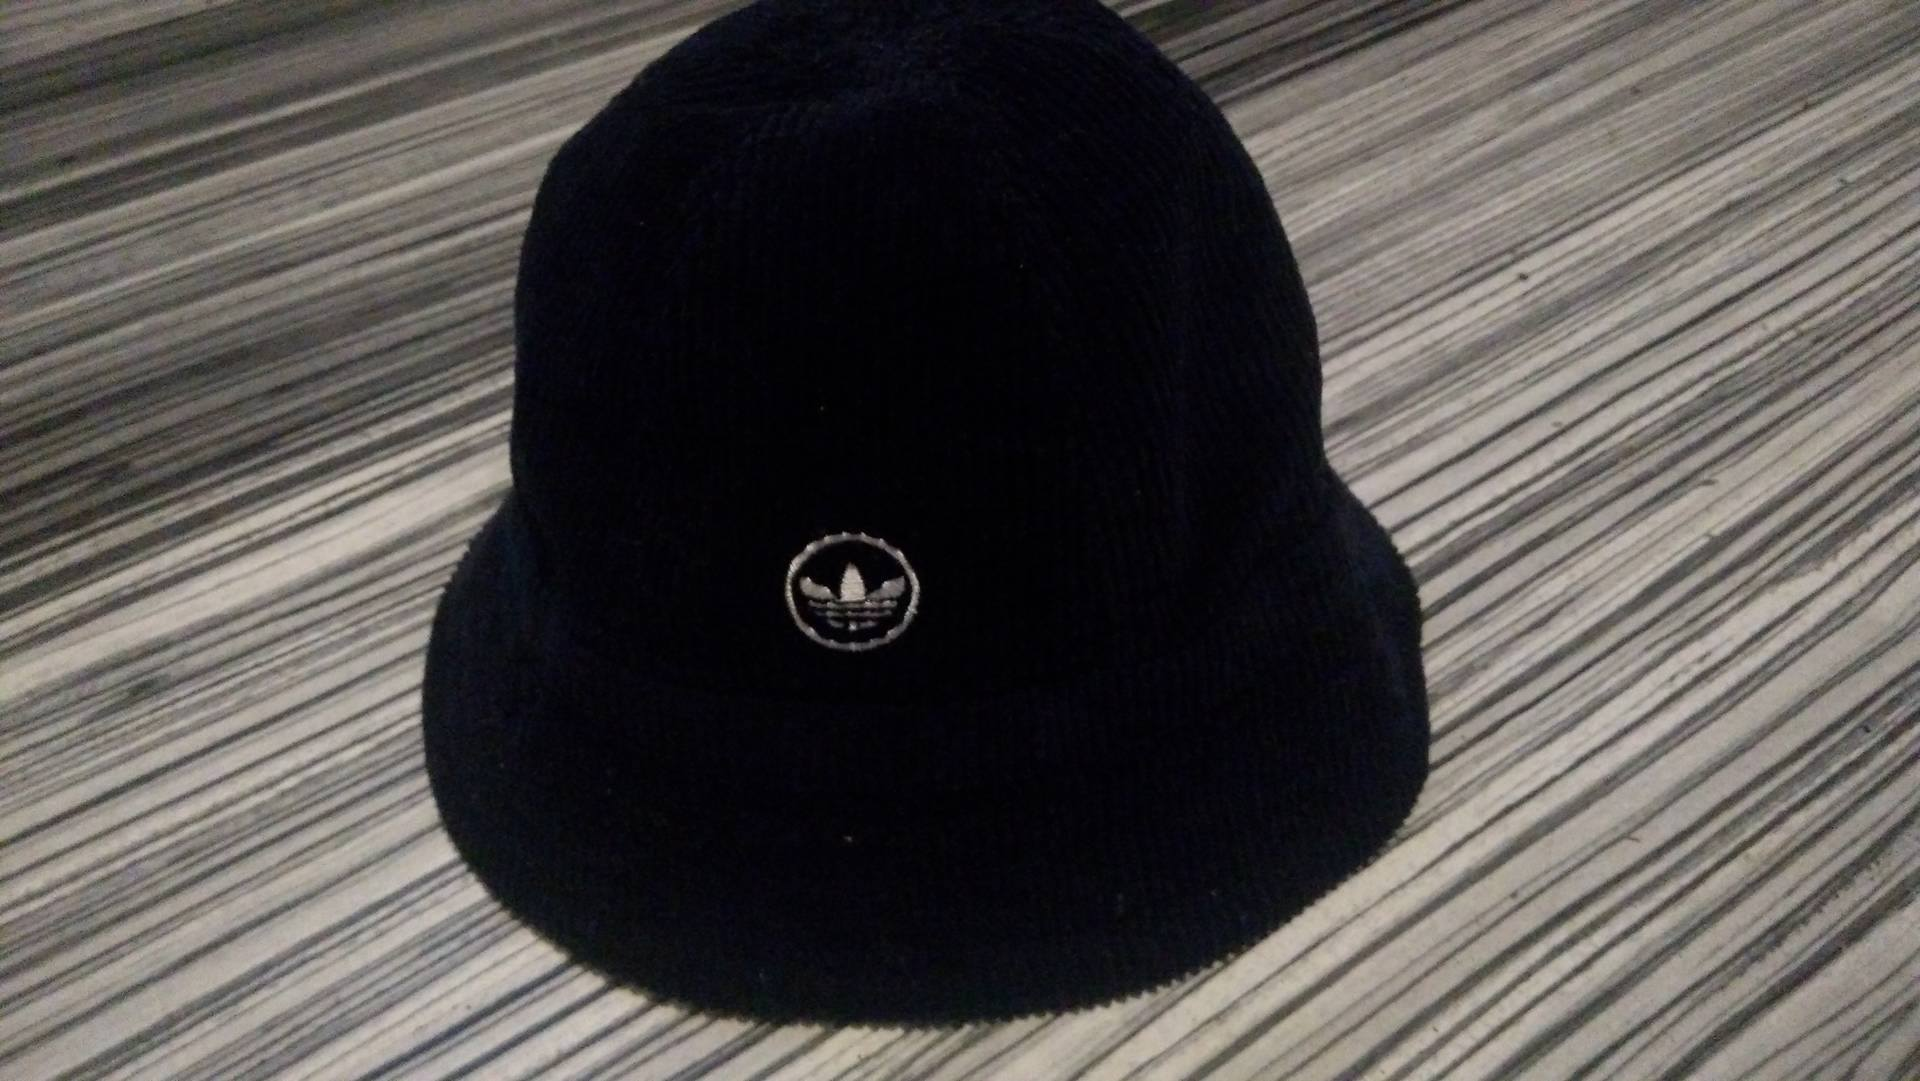 ADIDAS OLDSCHOOL kapelusz czapka